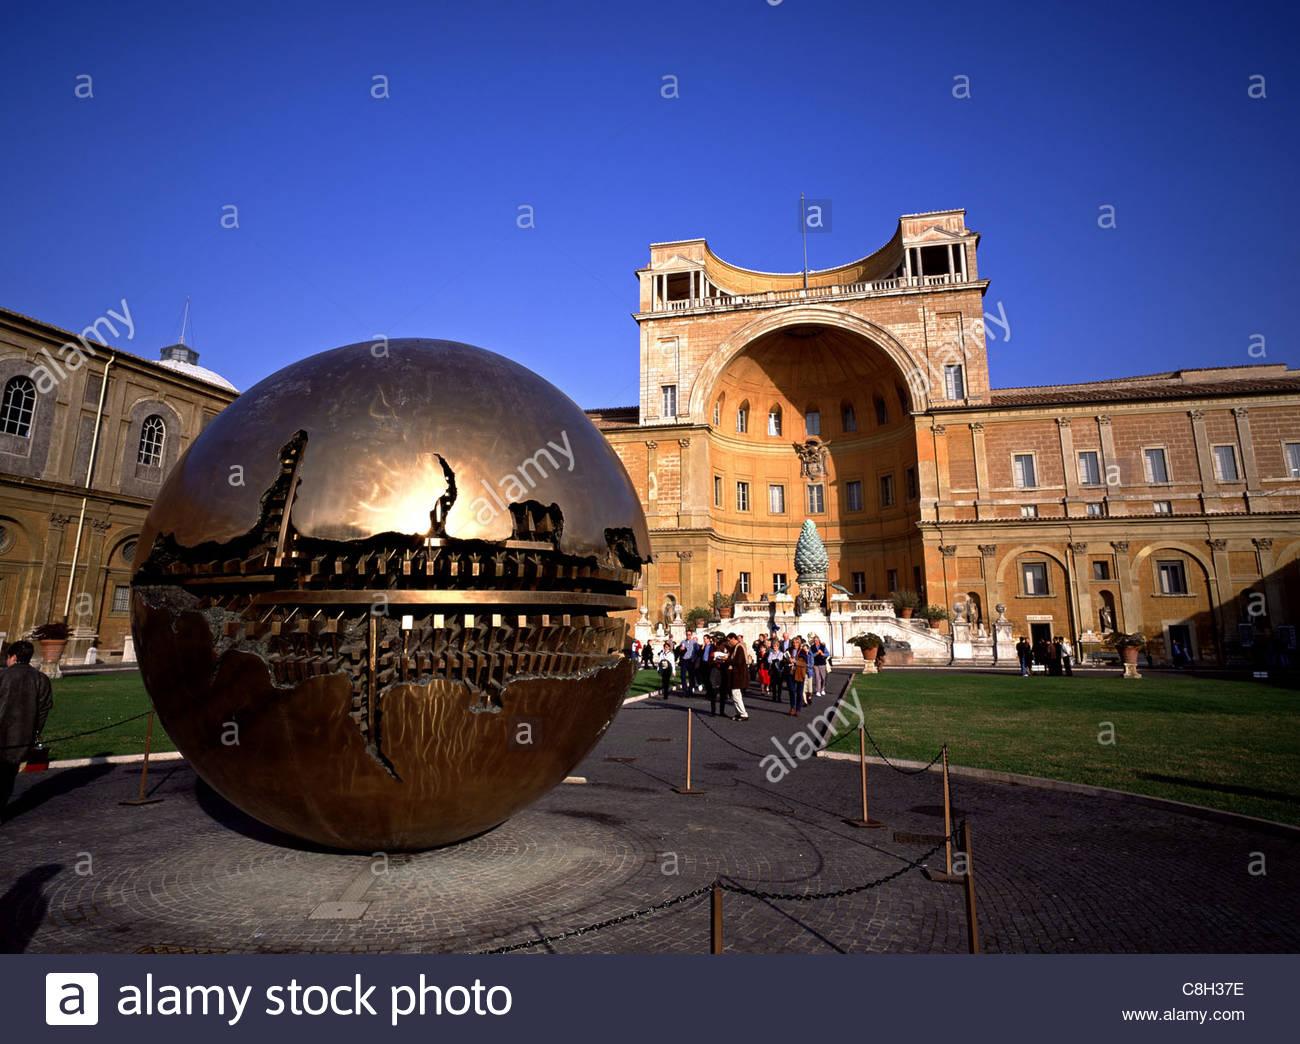 Arnaldo Pomodoro's Sphere within Sphere sculpture at The Vatican. - Stock Image